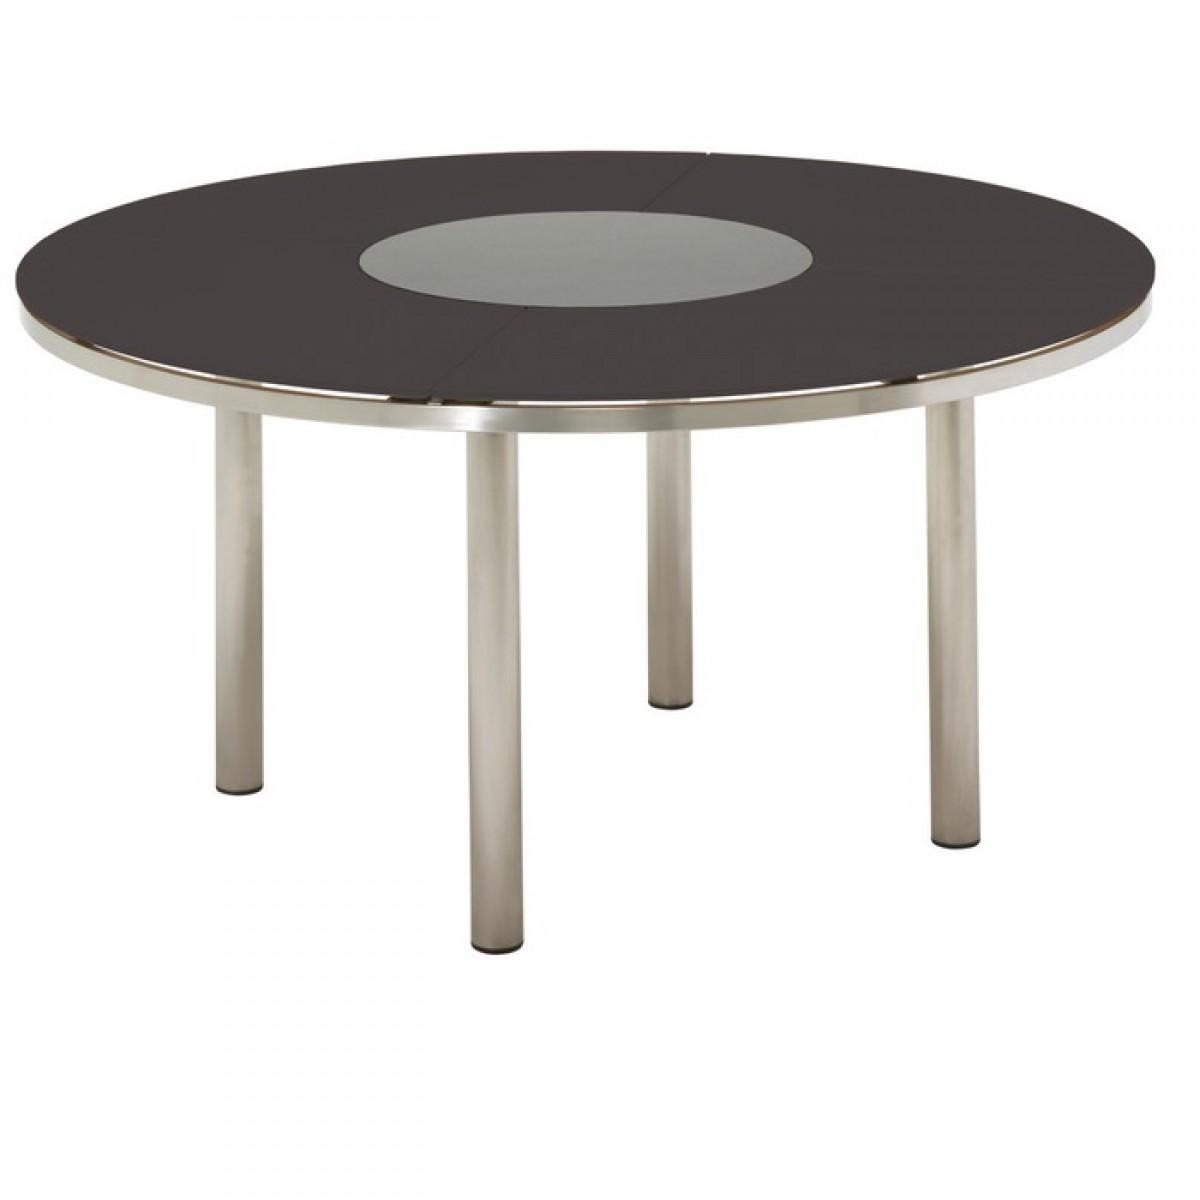 kore 58 5 round table glass top slate w lazy susan